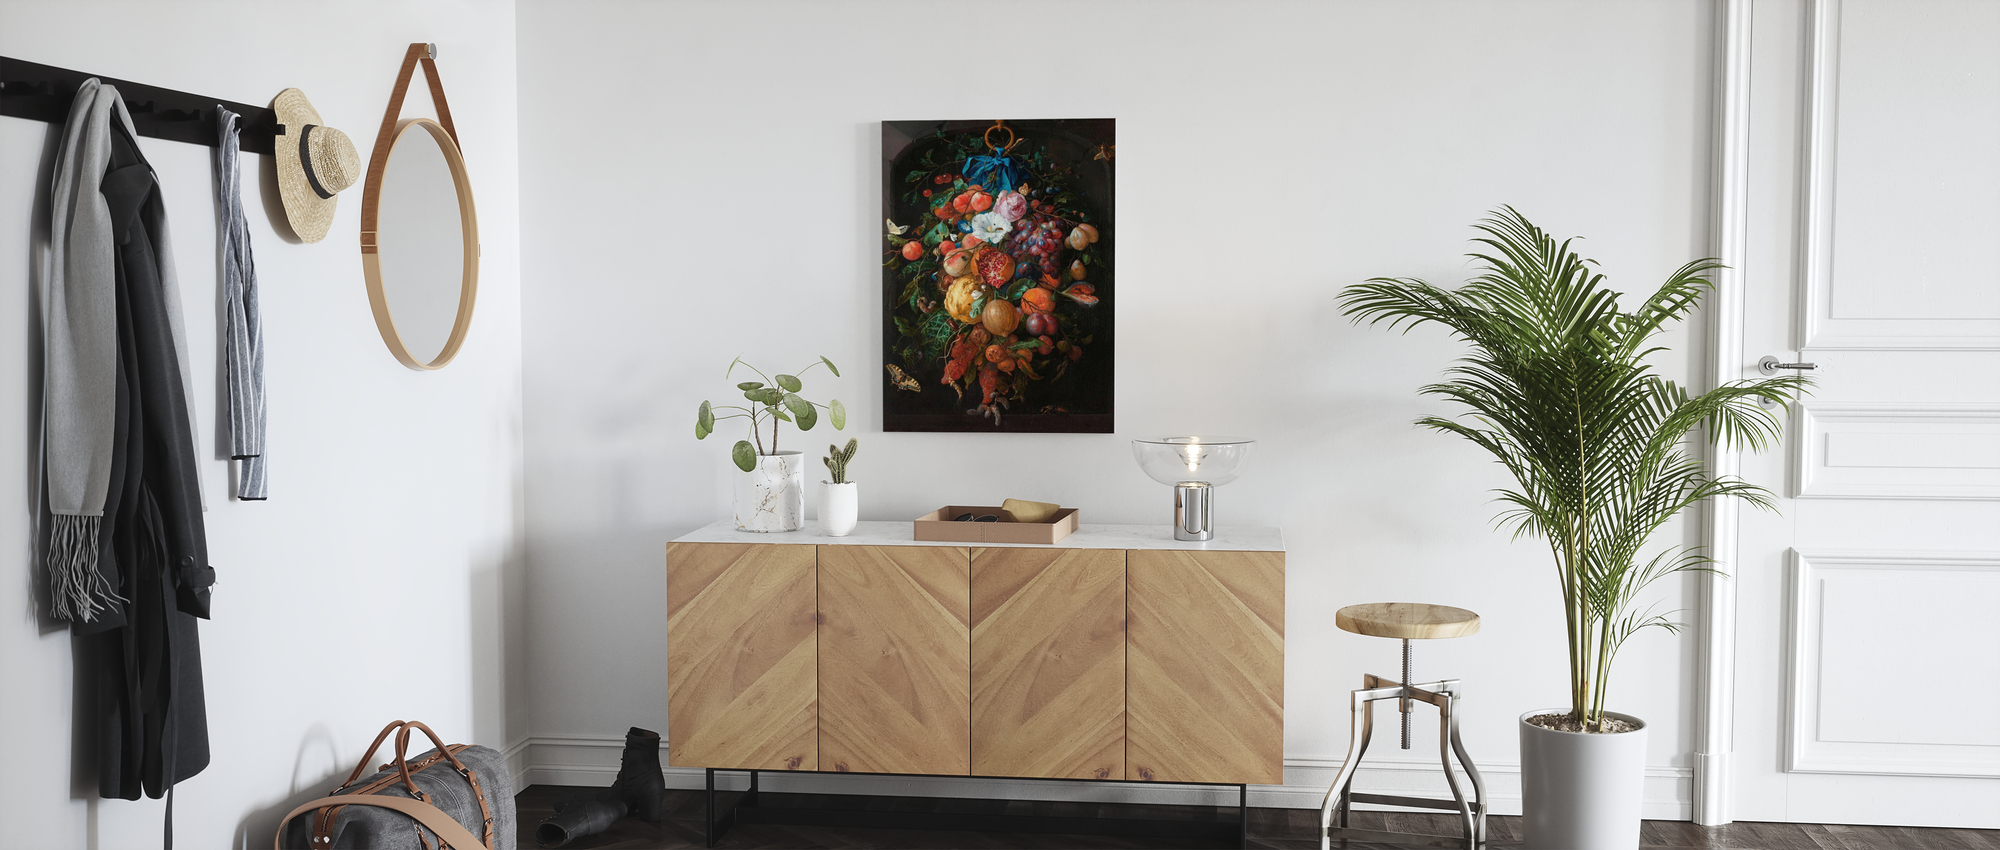 Jan Davidsz de Heem 15 x 18 inches Fruit Cross Stitch Festoon of Fruit and Flowers Cross Stitch Kit